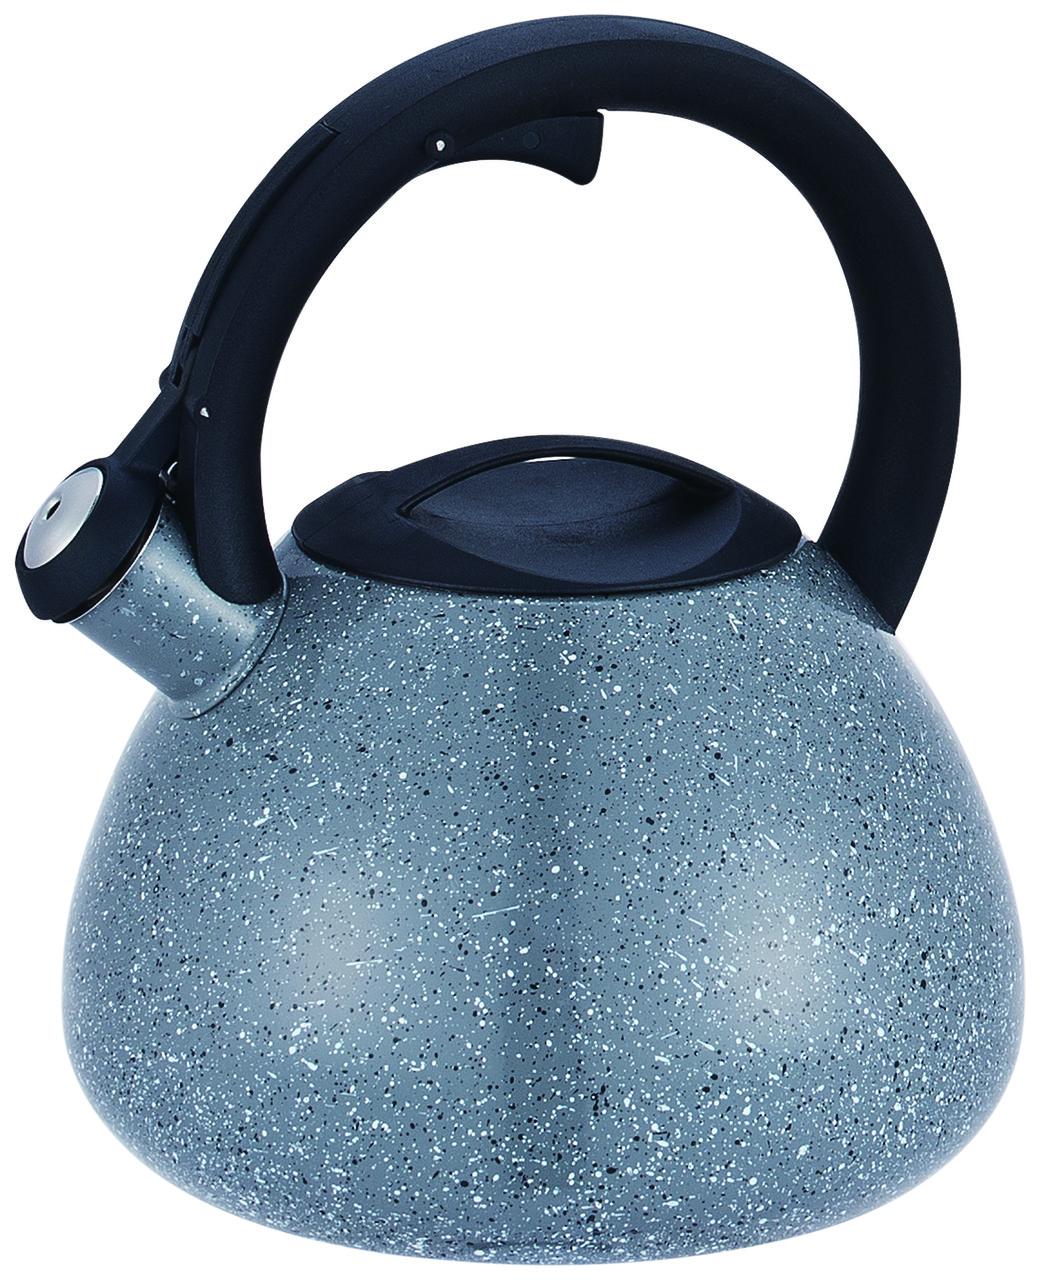 Чайник со свистком Con Brio 2.5л СВ-413 - серый